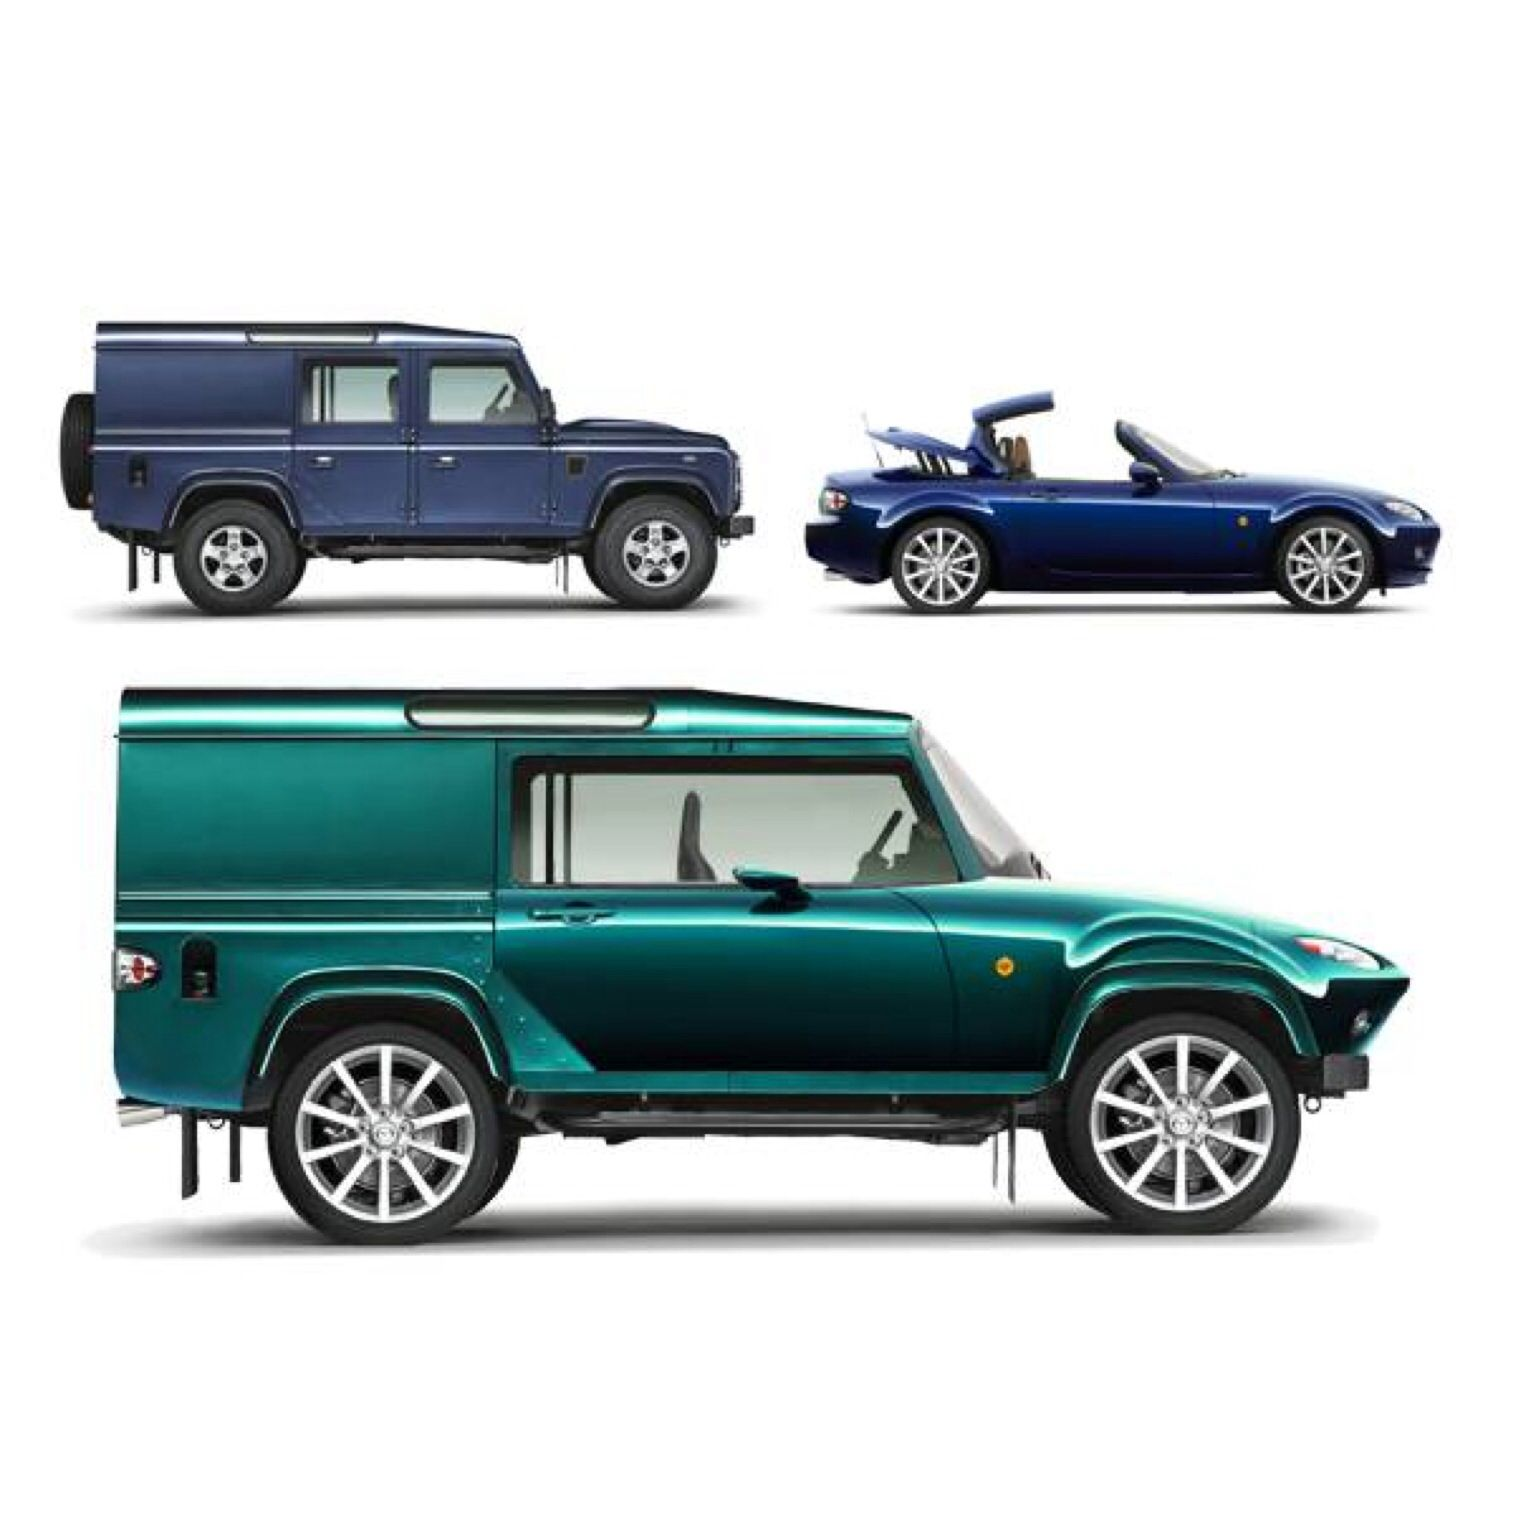 Land Rover Suvs: 173 New SUVs In Stock - Delray Beach